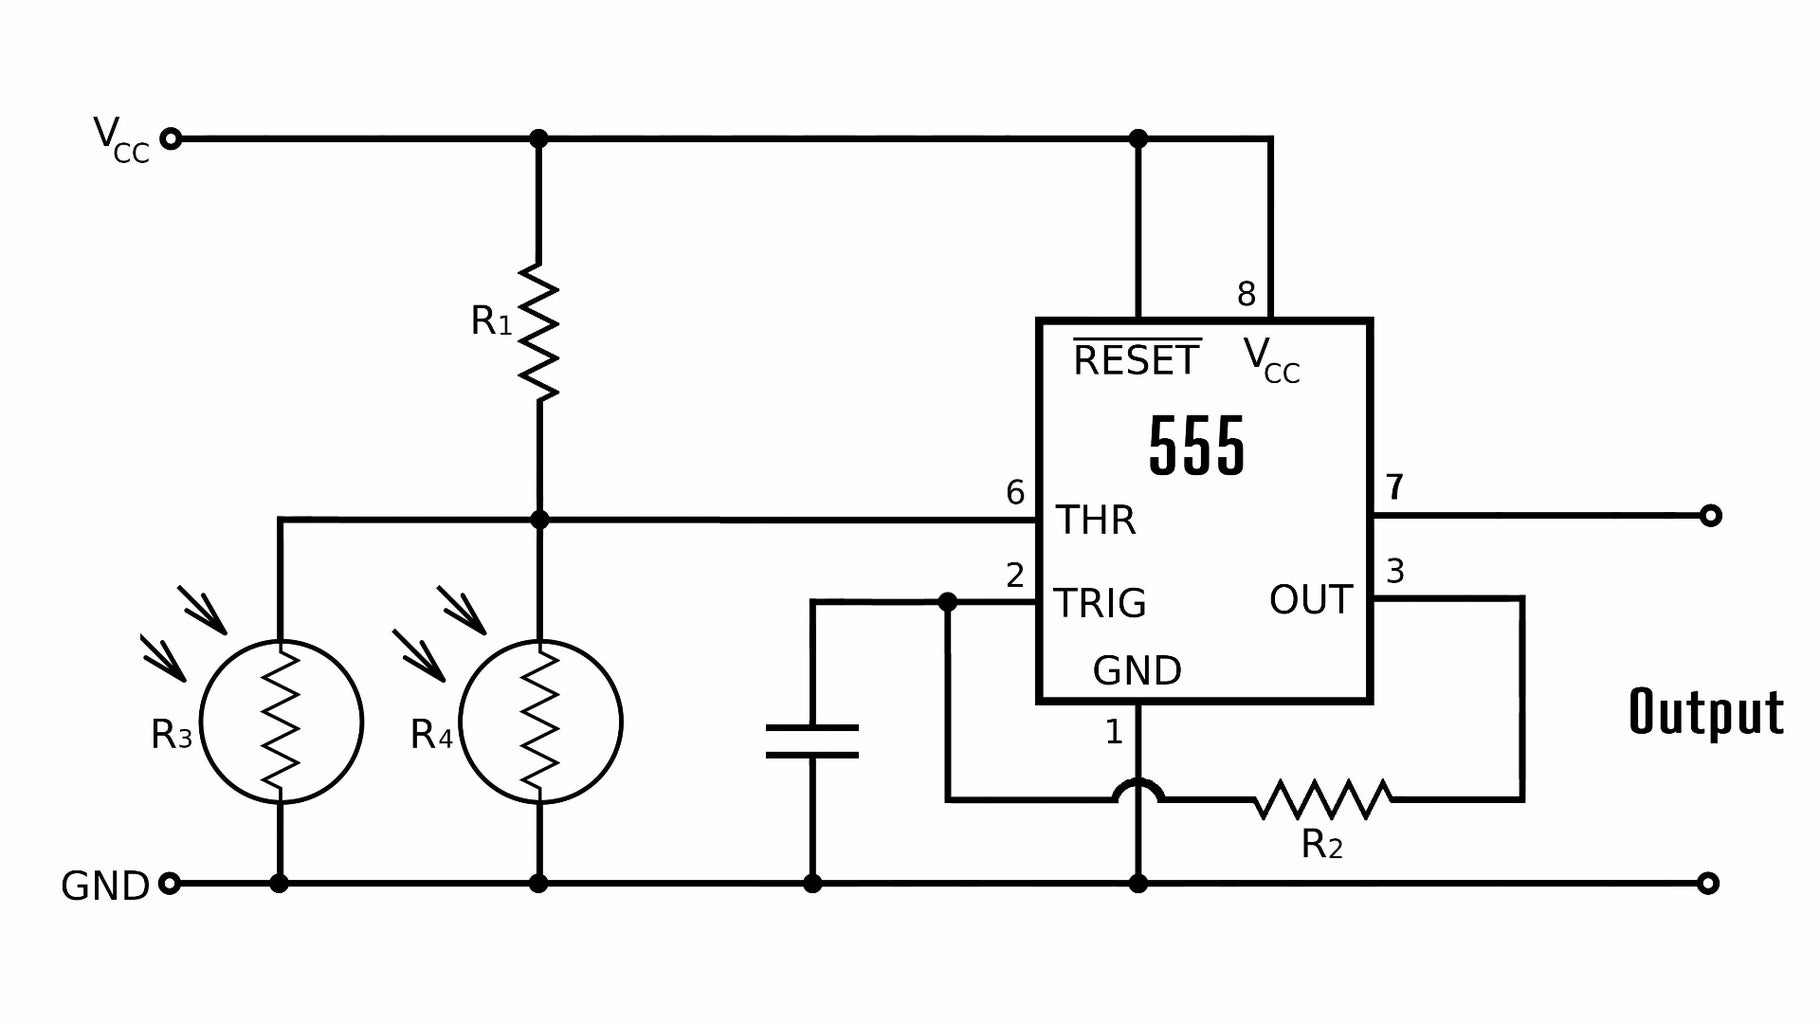 The Control Circuit